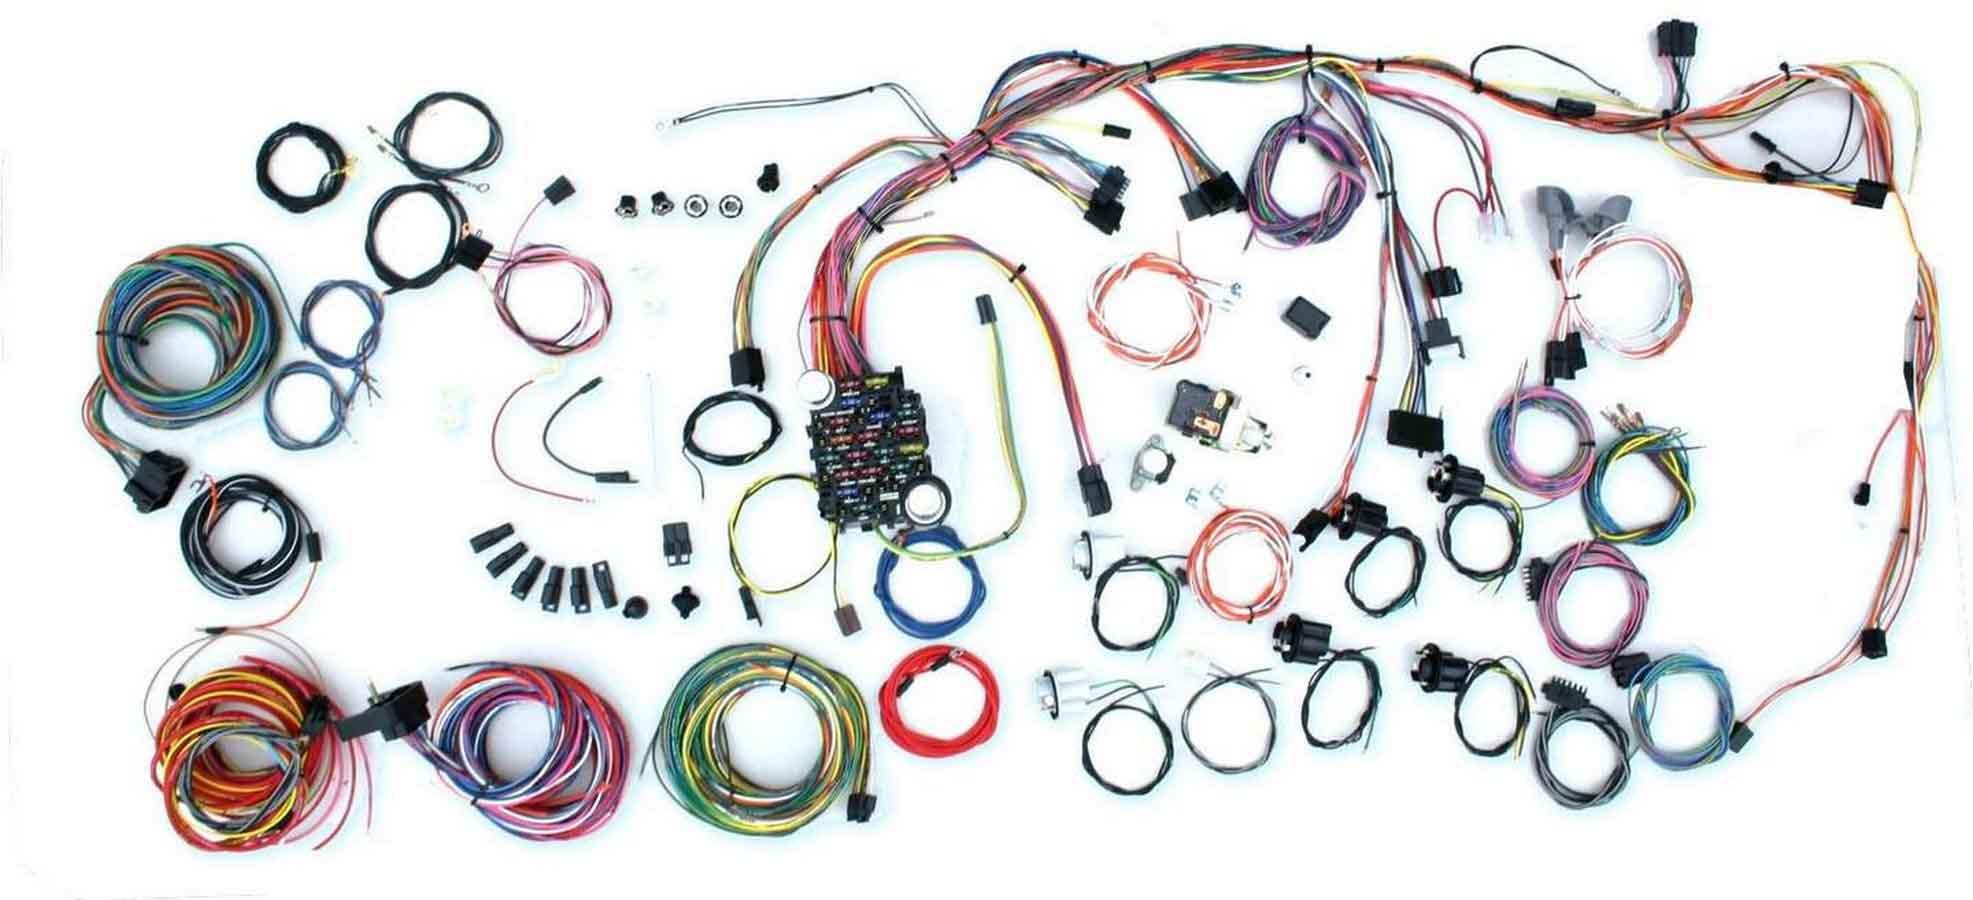 Grand Prix Auto Wiring Harness System 69 Camaro Wire